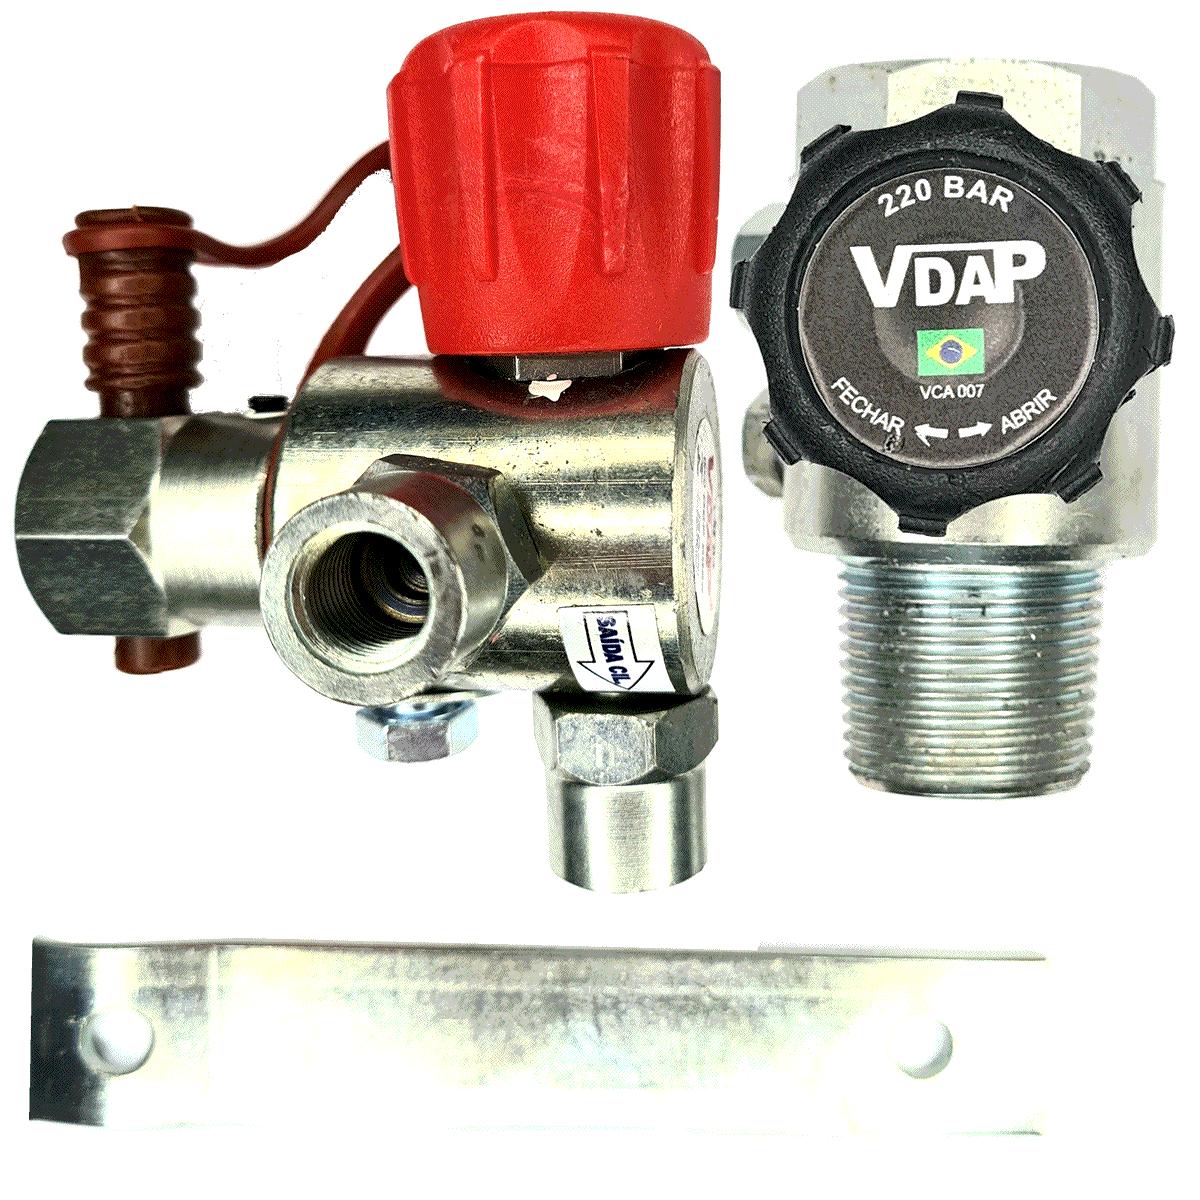 Kit 2 Válvulas VDAP Abastecimento e Cilindro (Par)